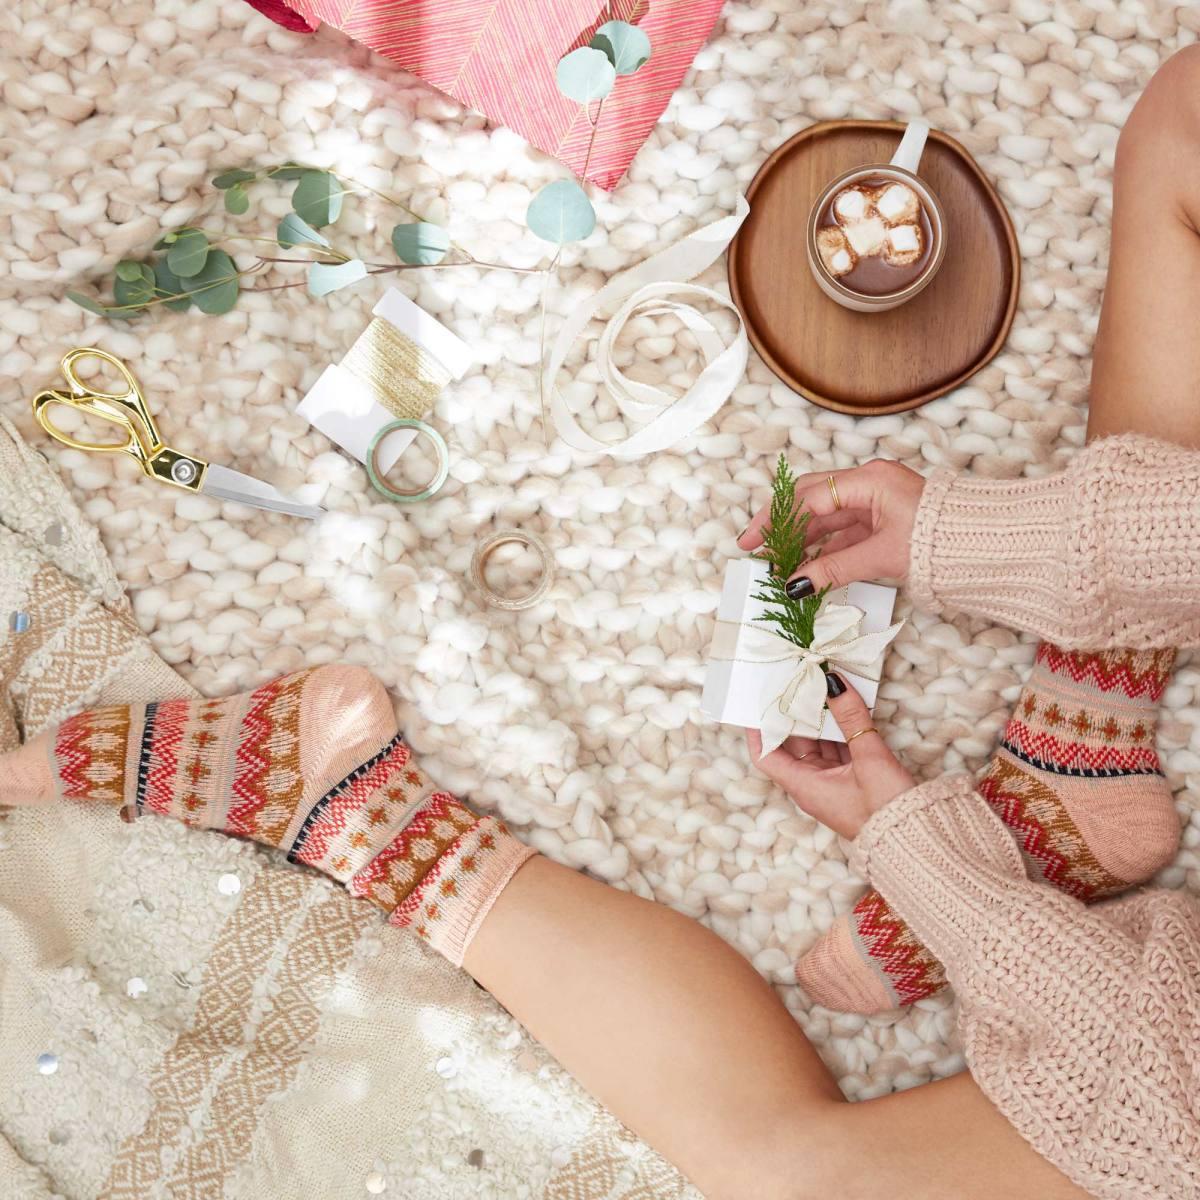 07-eBay_18_November_Social_Gift_Wrapping_Coffee_Mug_0696